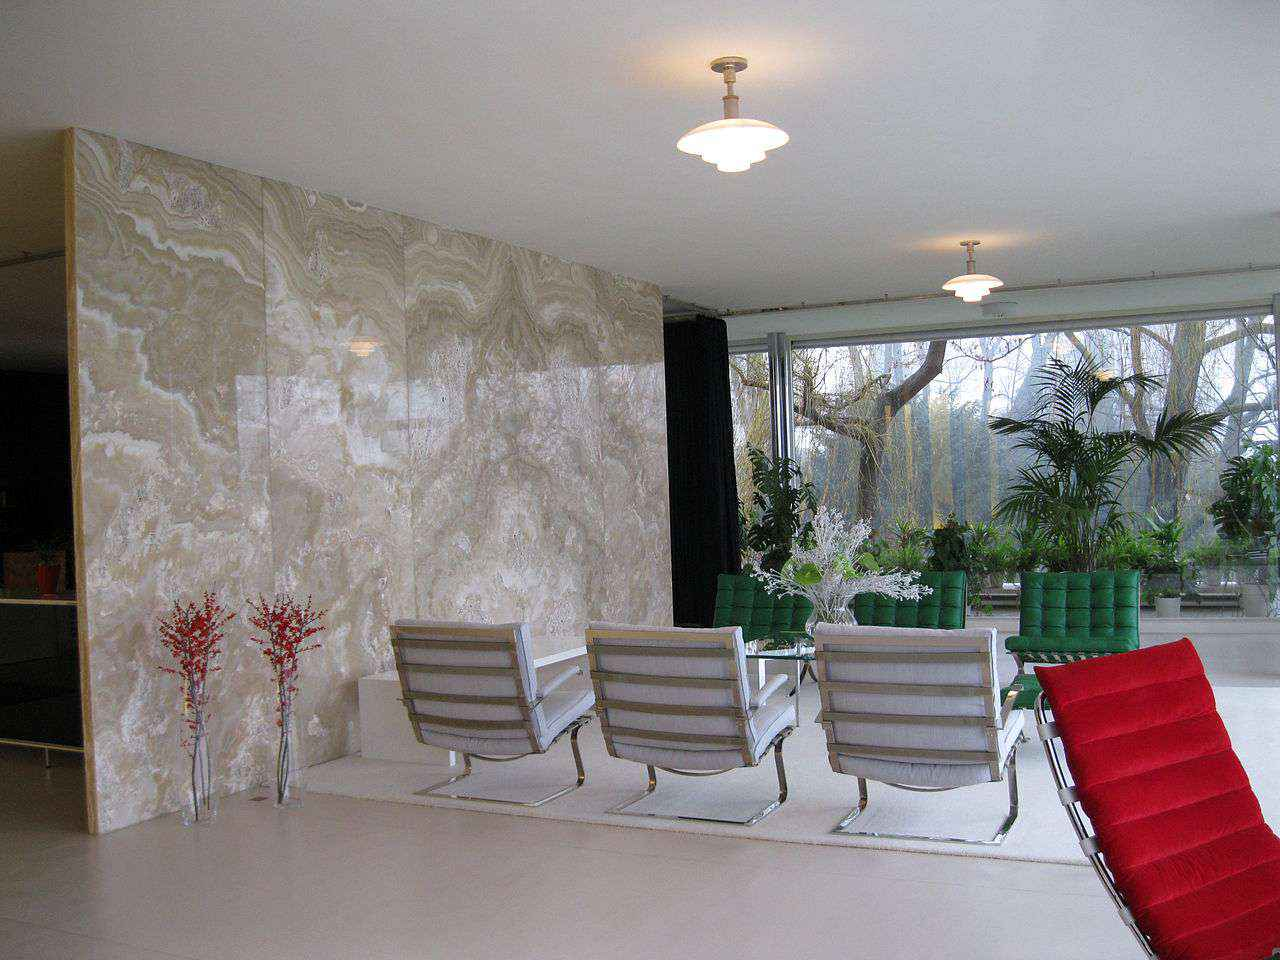 Tugendhat Villa Ludwig Mies Van Der Rohe Architectural Cad Drawings # Muebles Mies Van Der Rohe Autocad